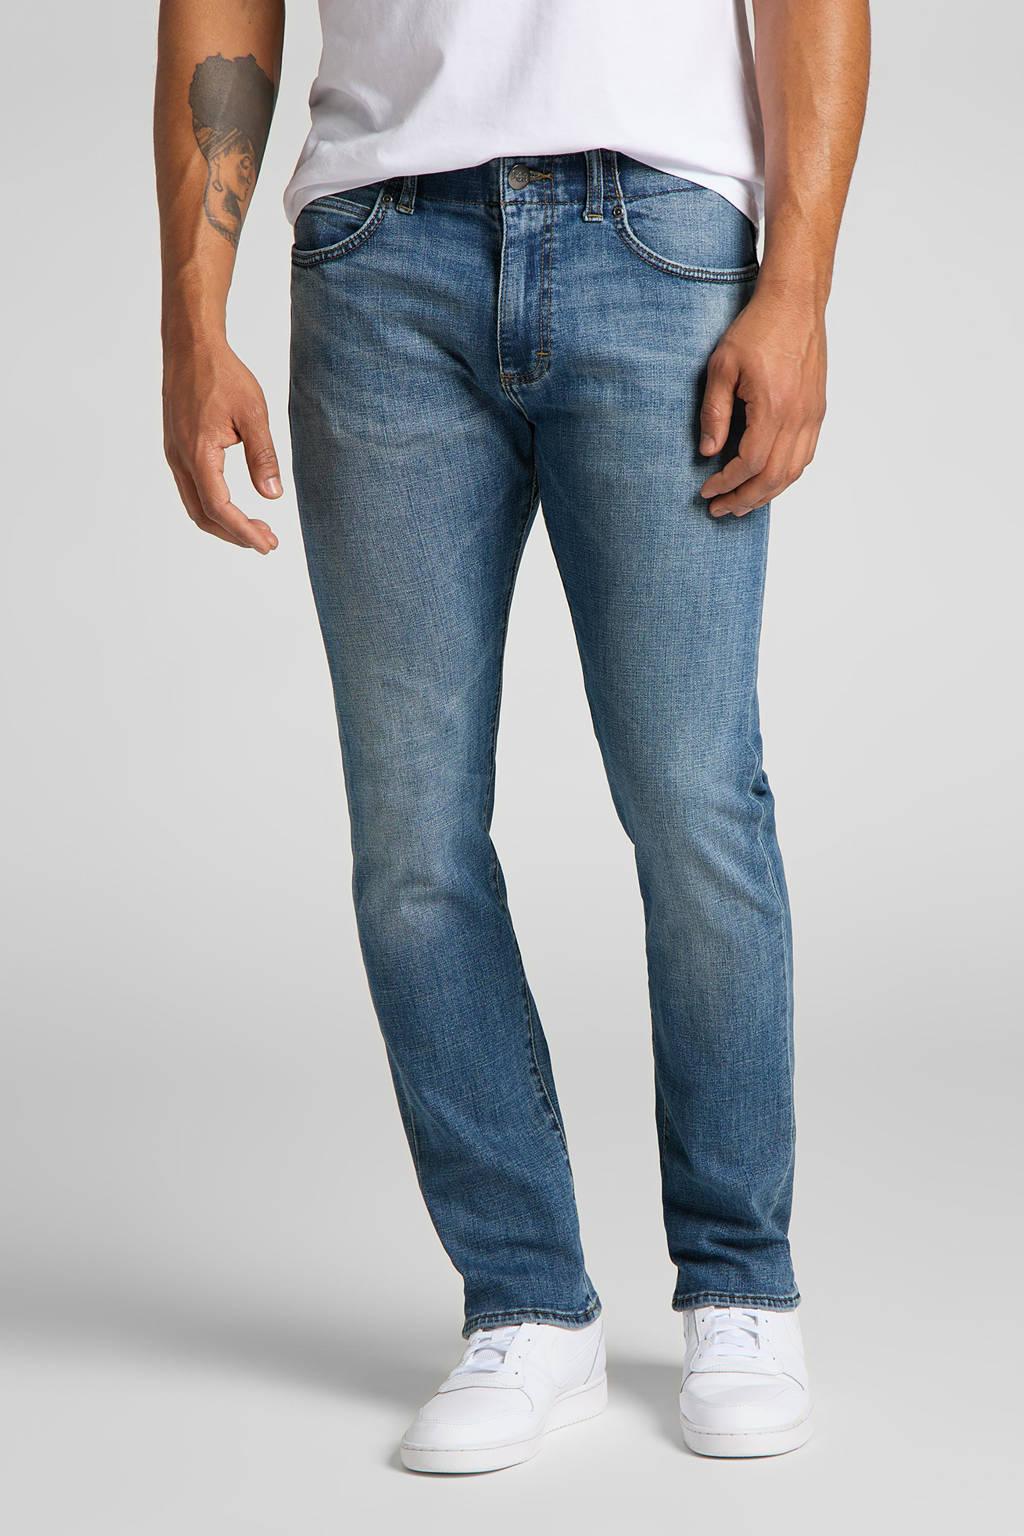 Lee slim fit jeans lenny, Lenny